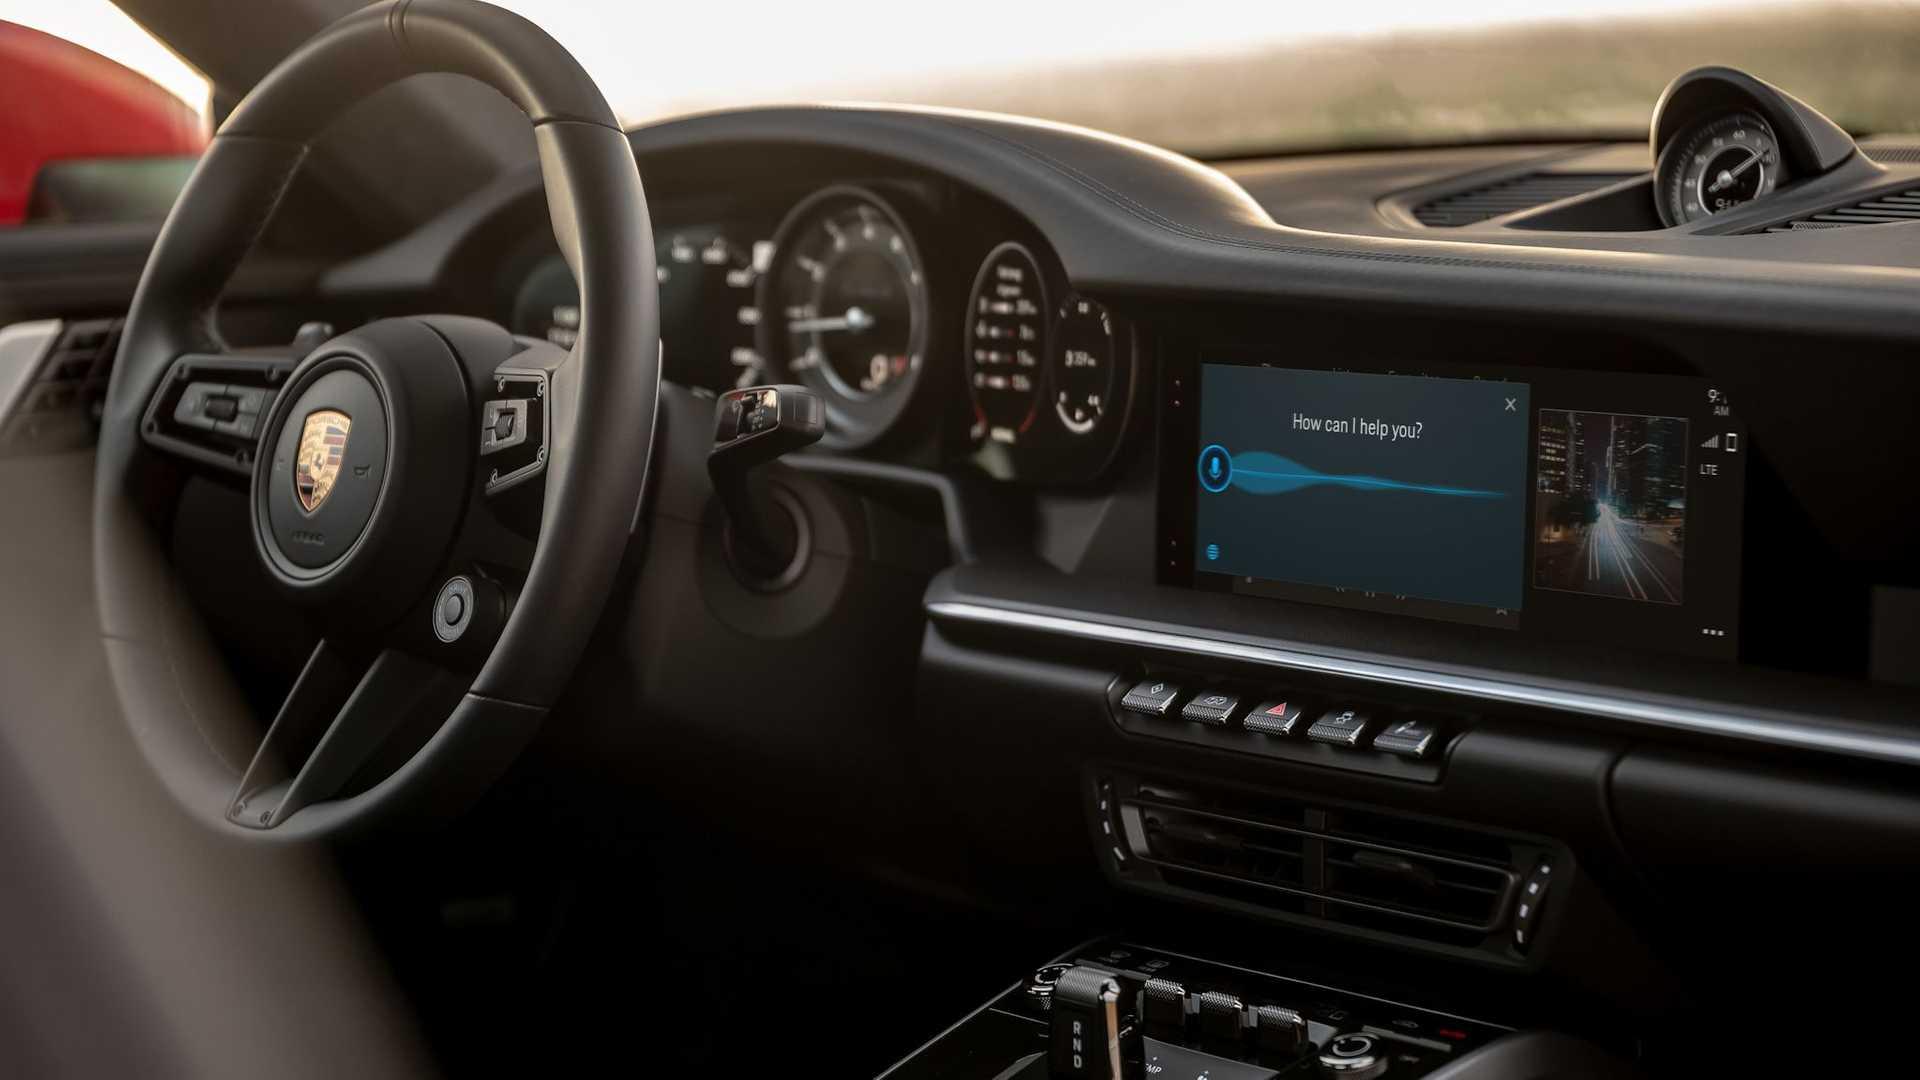 Porsche-Communication-Management-6-17